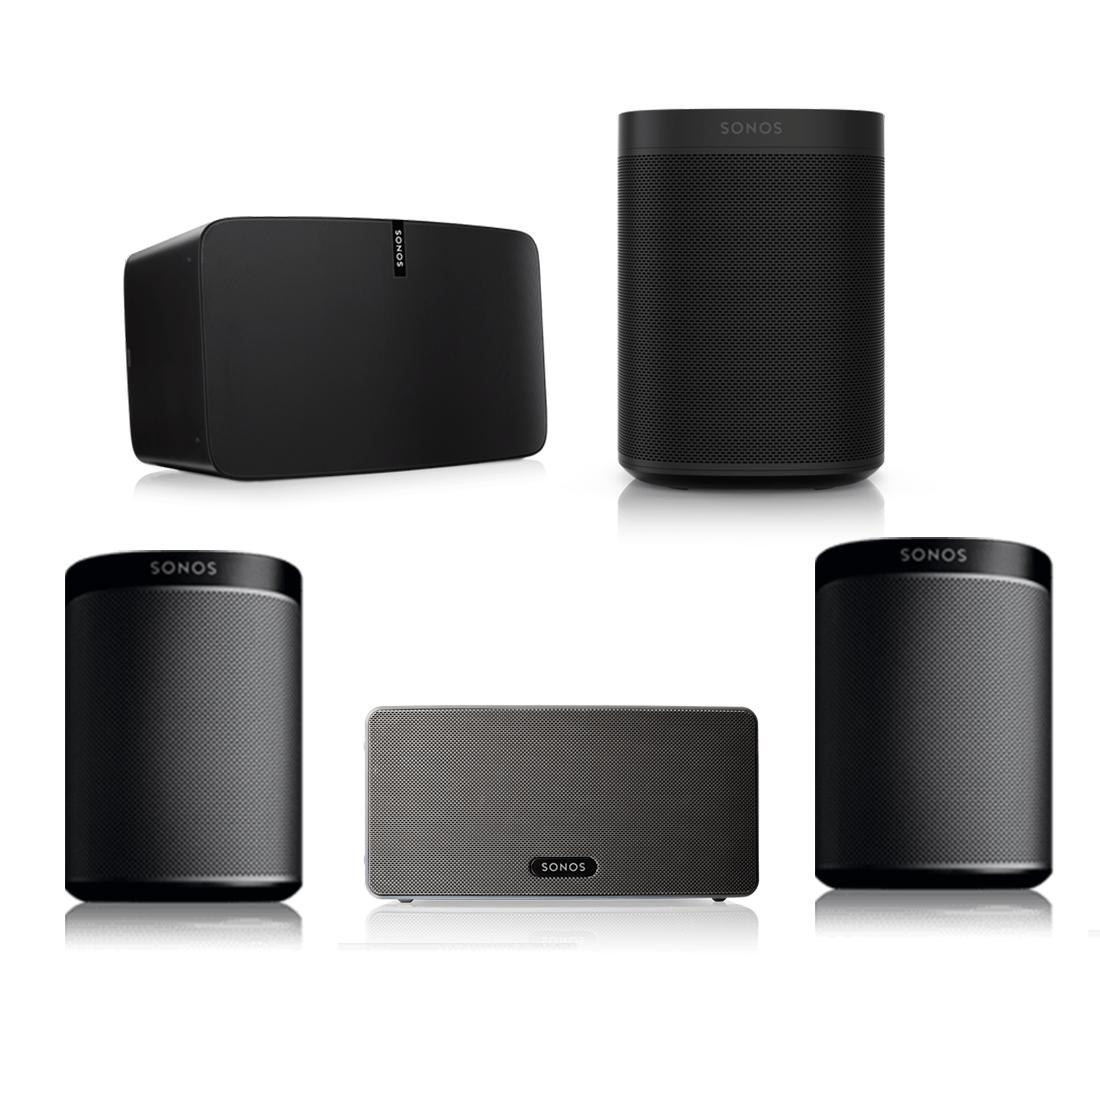 sonos one wireless speaker sonos play 1 wireless speaker. Black Bedroom Furniture Sets. Home Design Ideas